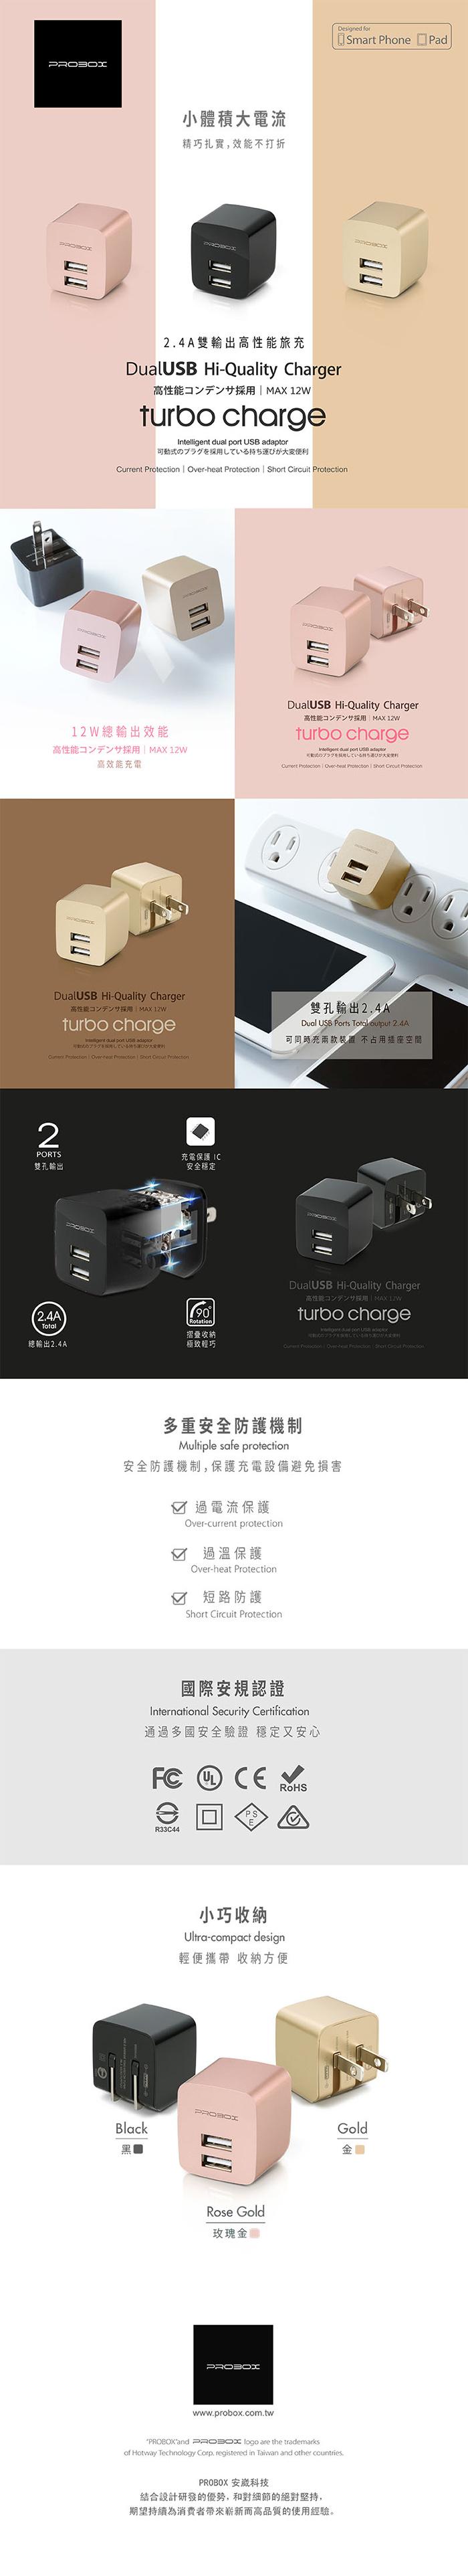 PROBOX 2.4A USB雙埠電源供應器